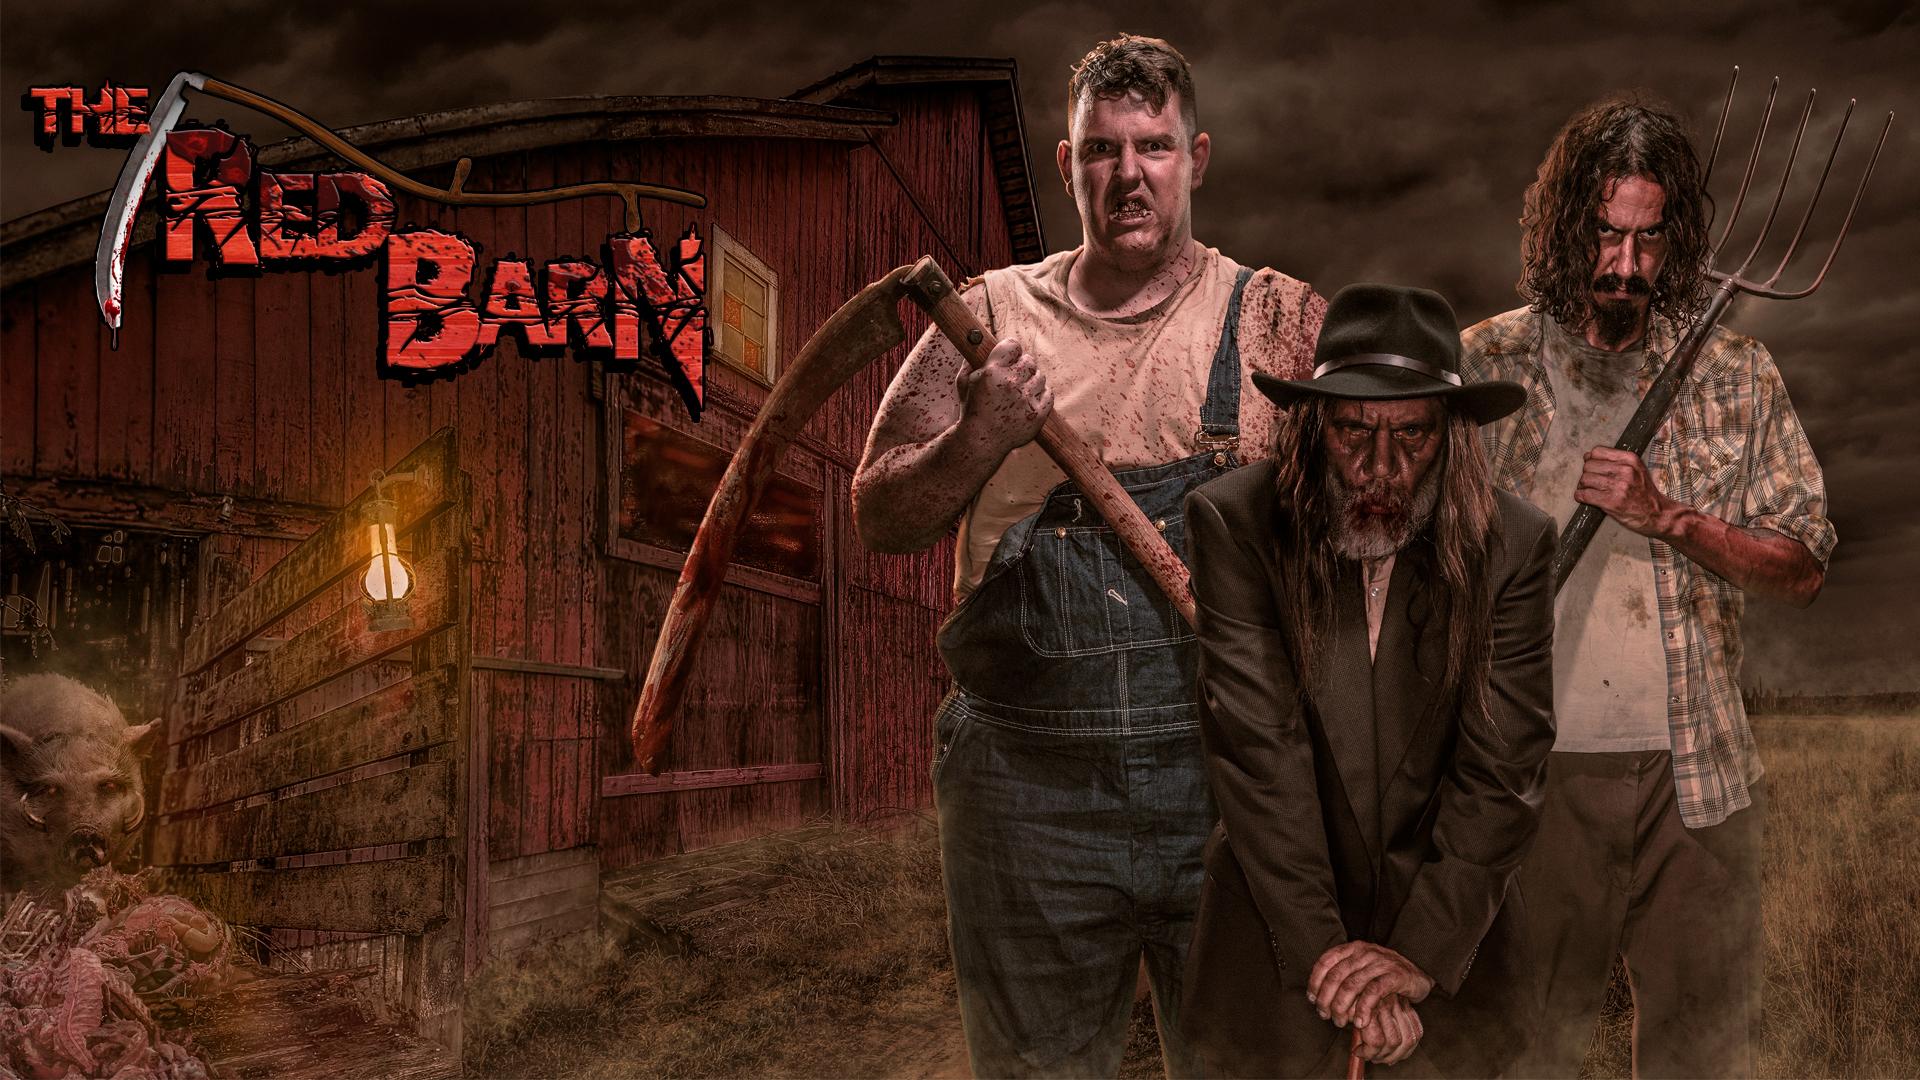 The Red Barn (Image courtesy of Knott's Scary Farm)